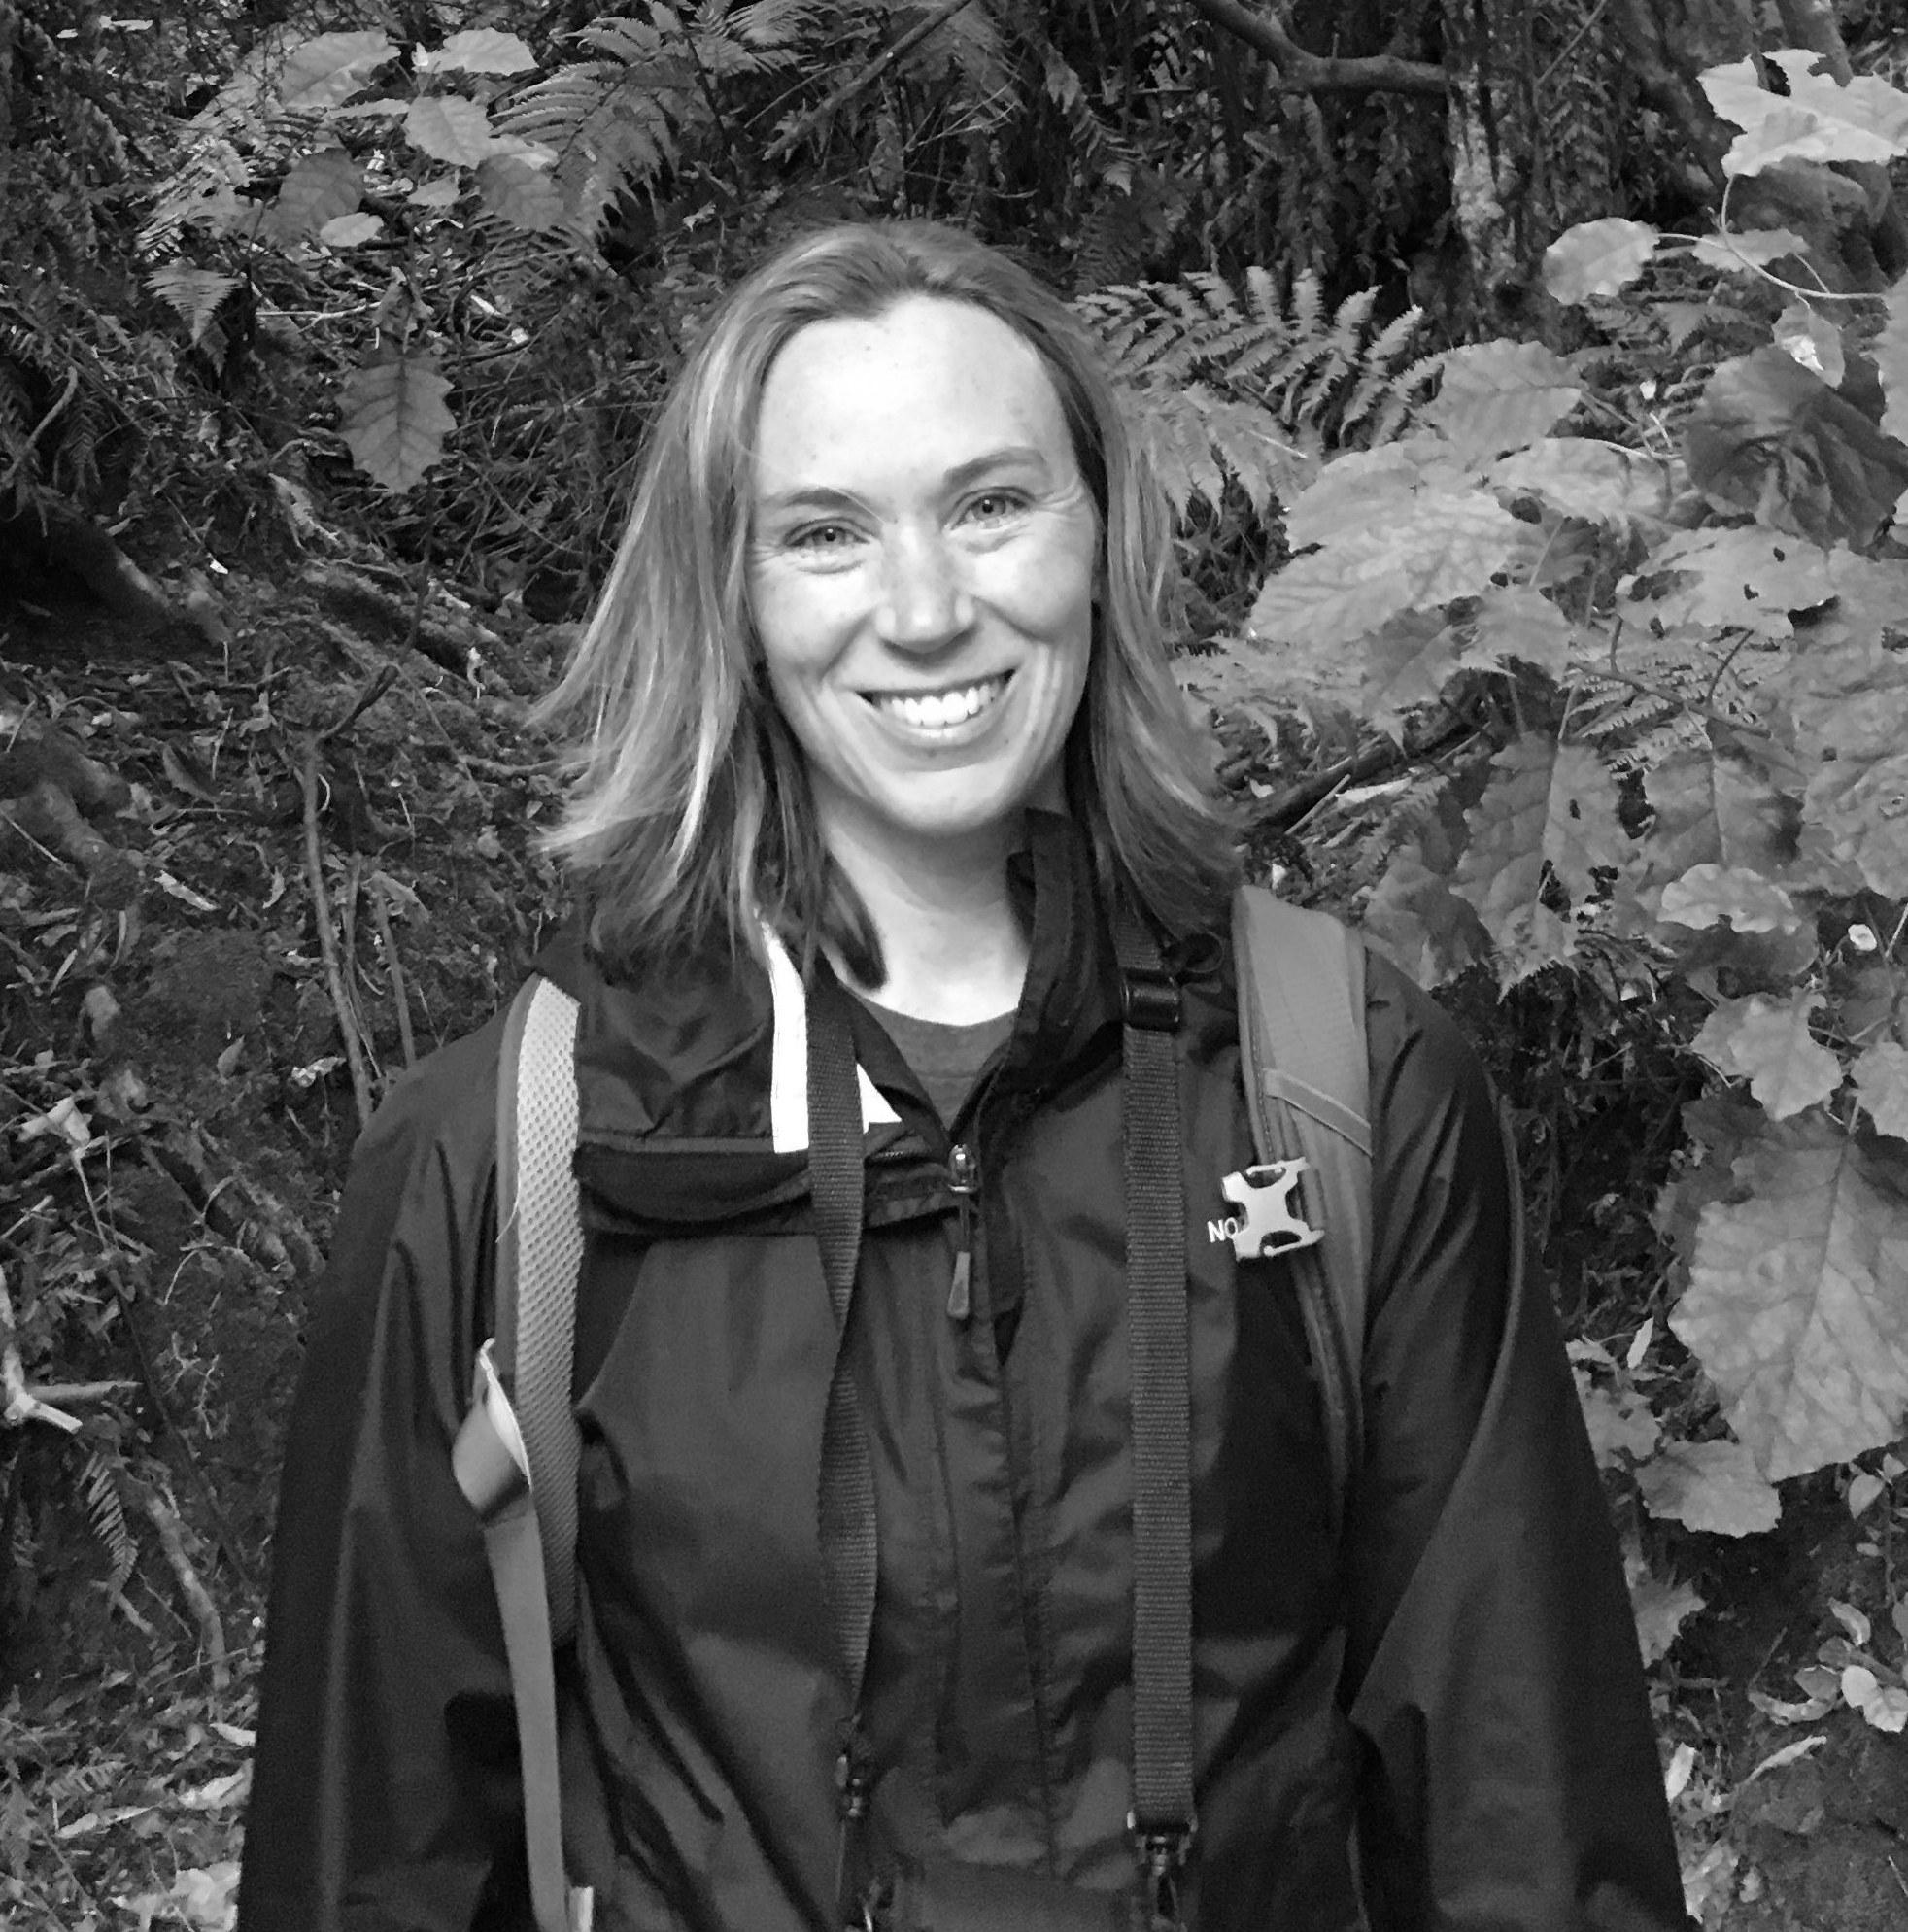 iEARN-USA Change Maker: Heather Berry GEA Bio